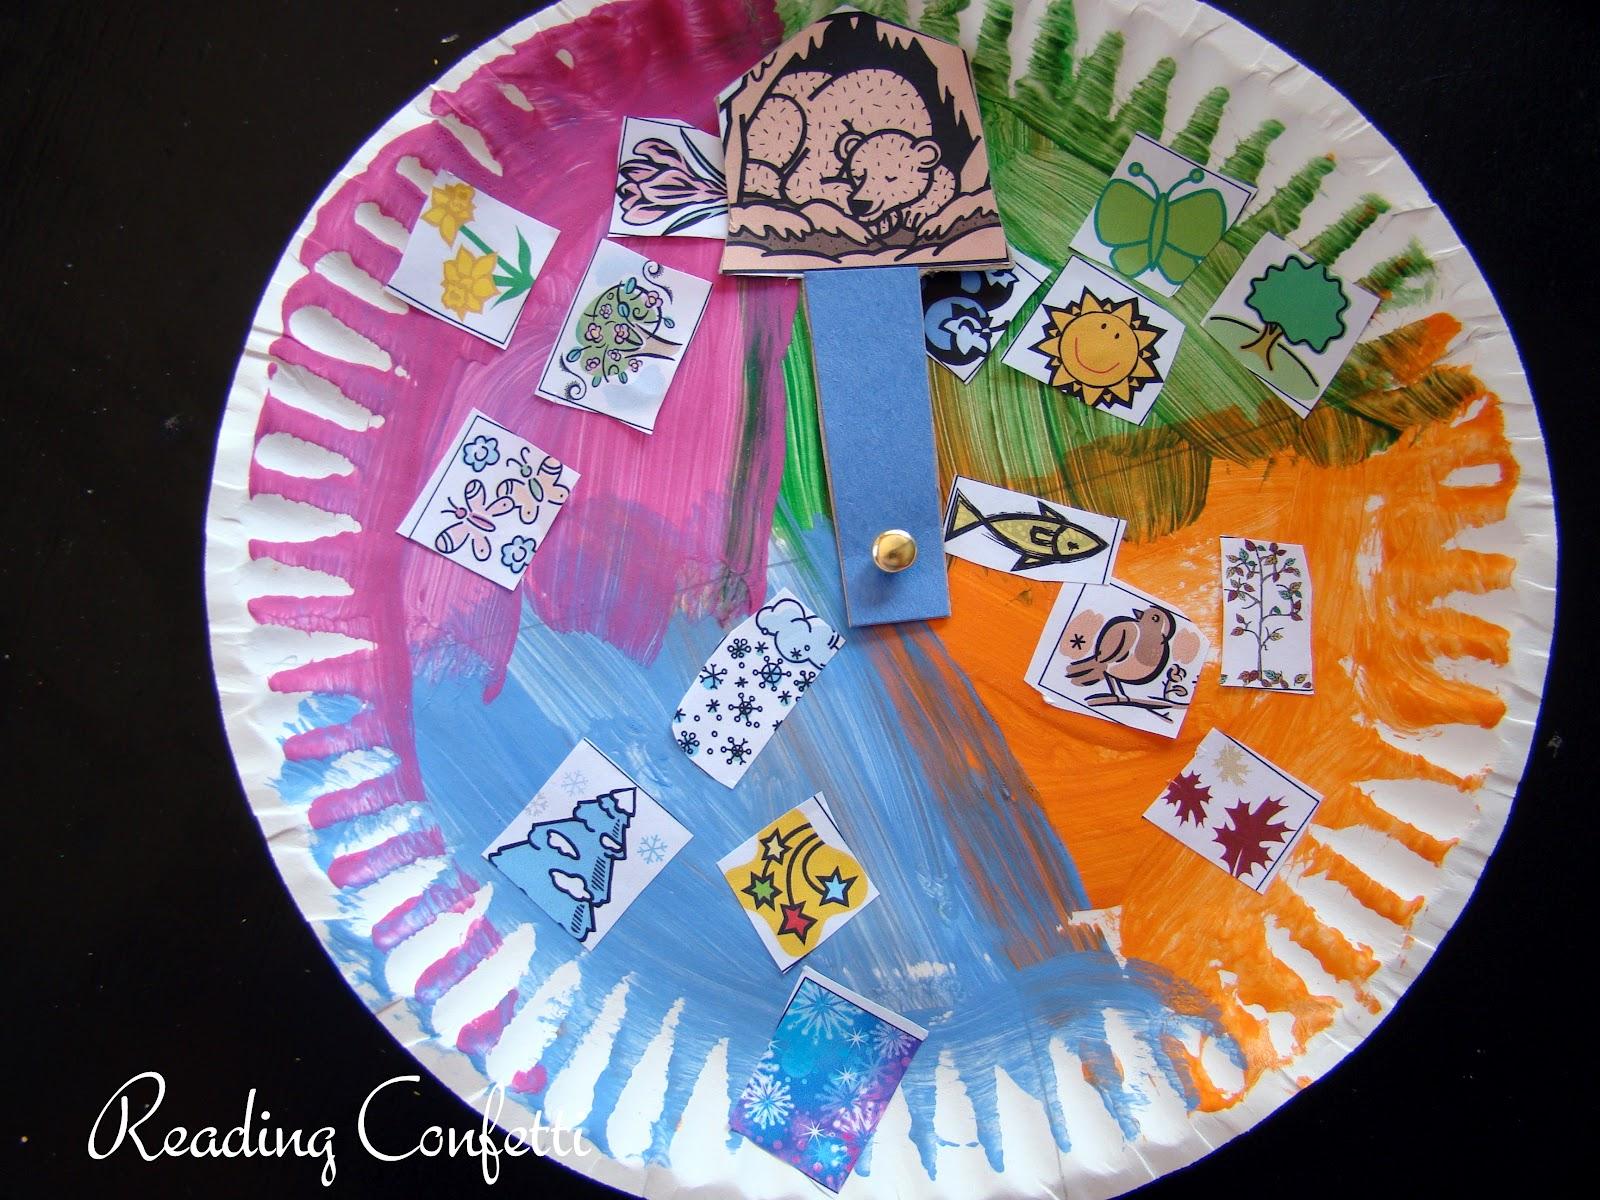 Old Bear 4 Seasons Craft August Virtual Book Club Reading Confetti